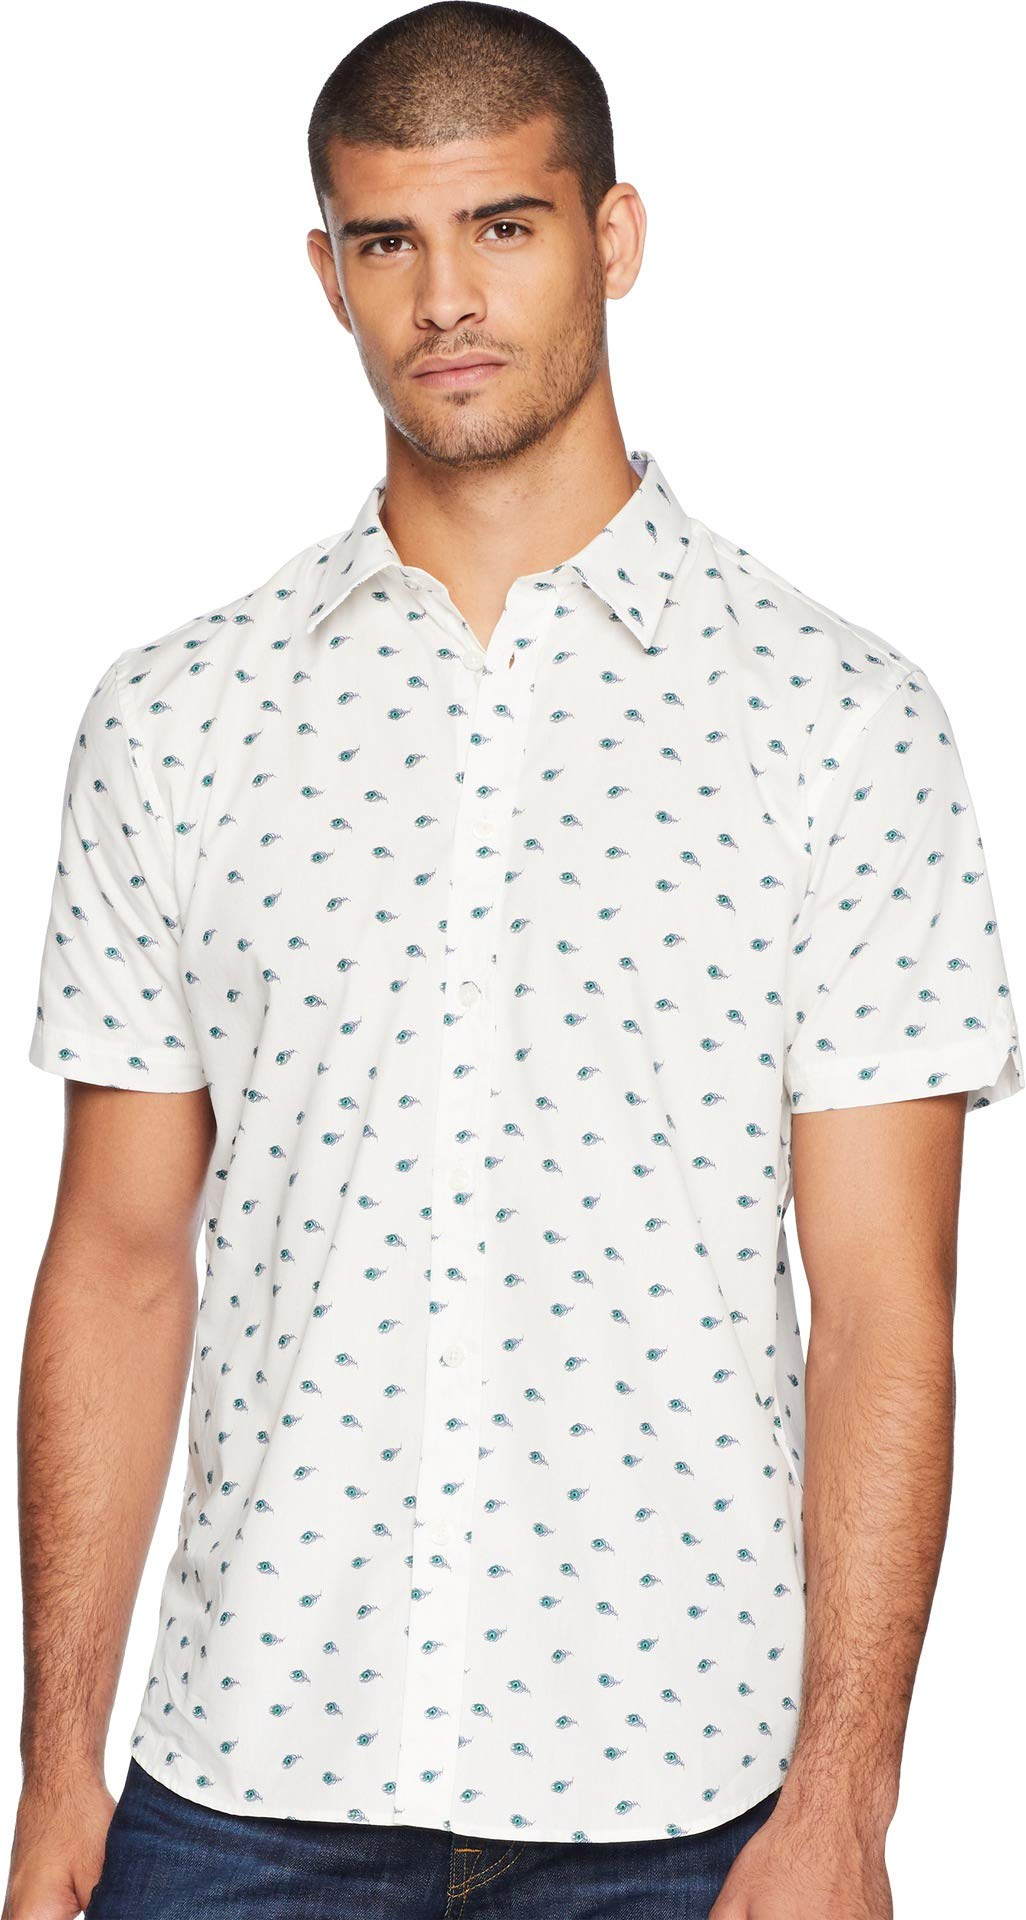 Ben Sherman Men's Short Sleeve Peacock Feather Print Shirt, White, Large